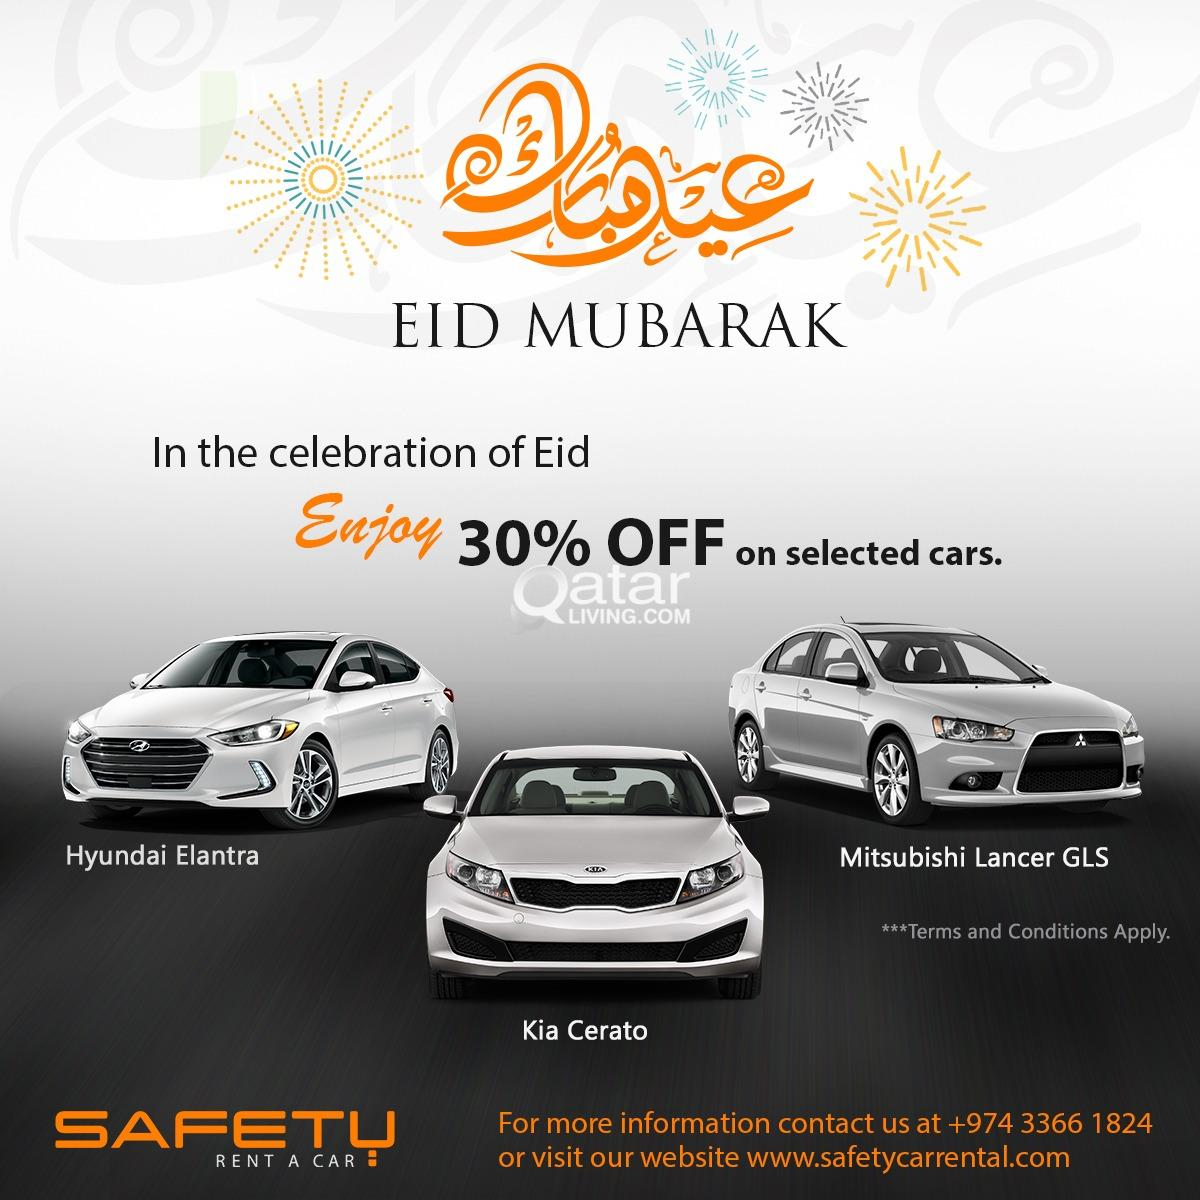 Get 30% off in celebration of Eid al-Fitr from Saf